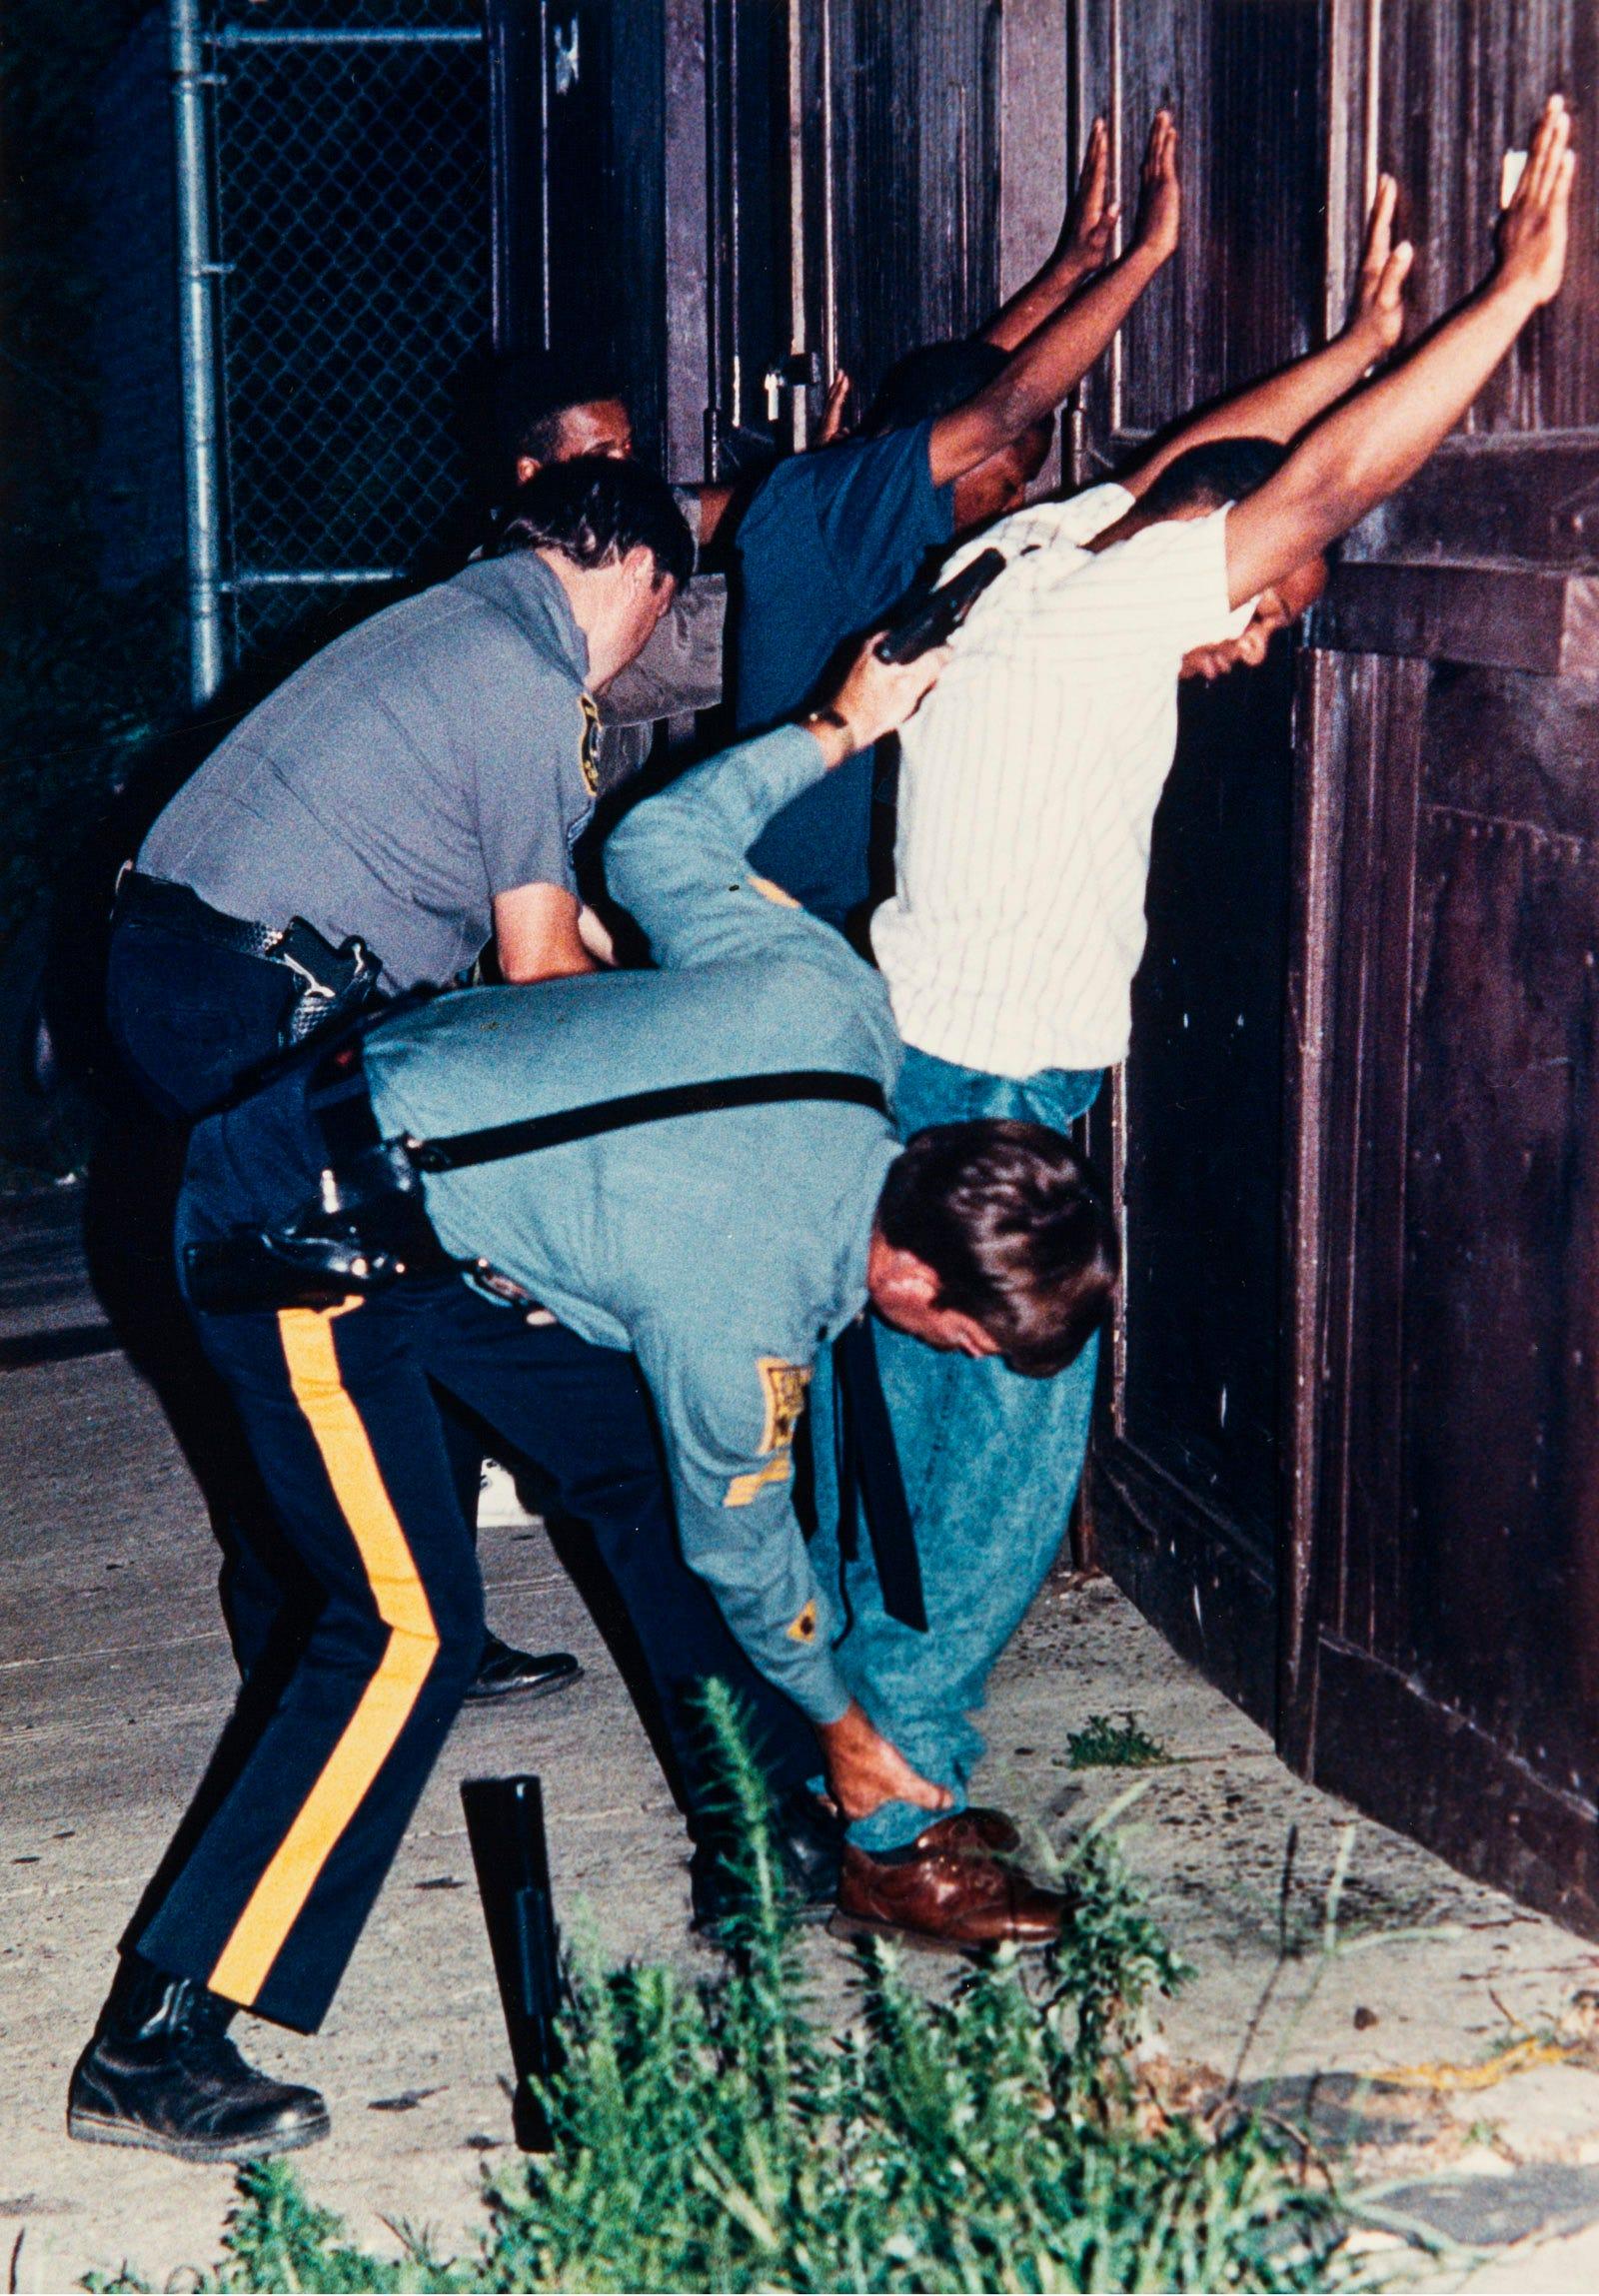 Suspects being taken into custody in Newark in 1990.